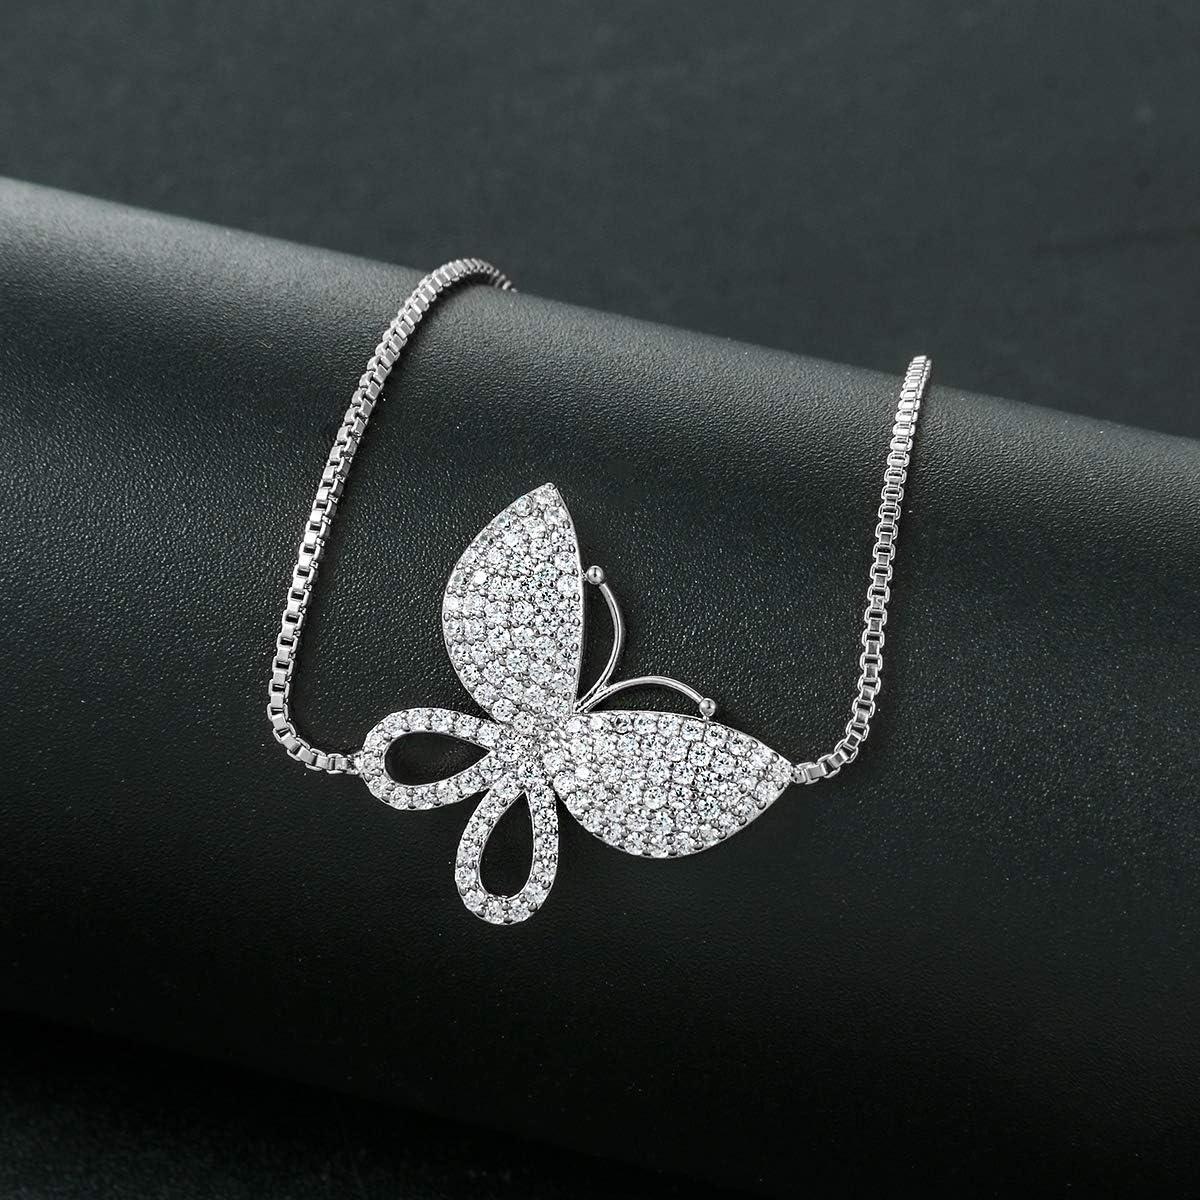 WeimanJewelry Love Gift Cubic Zirconia CZ Bridal Butterfly Adjustable Bracelet for Women